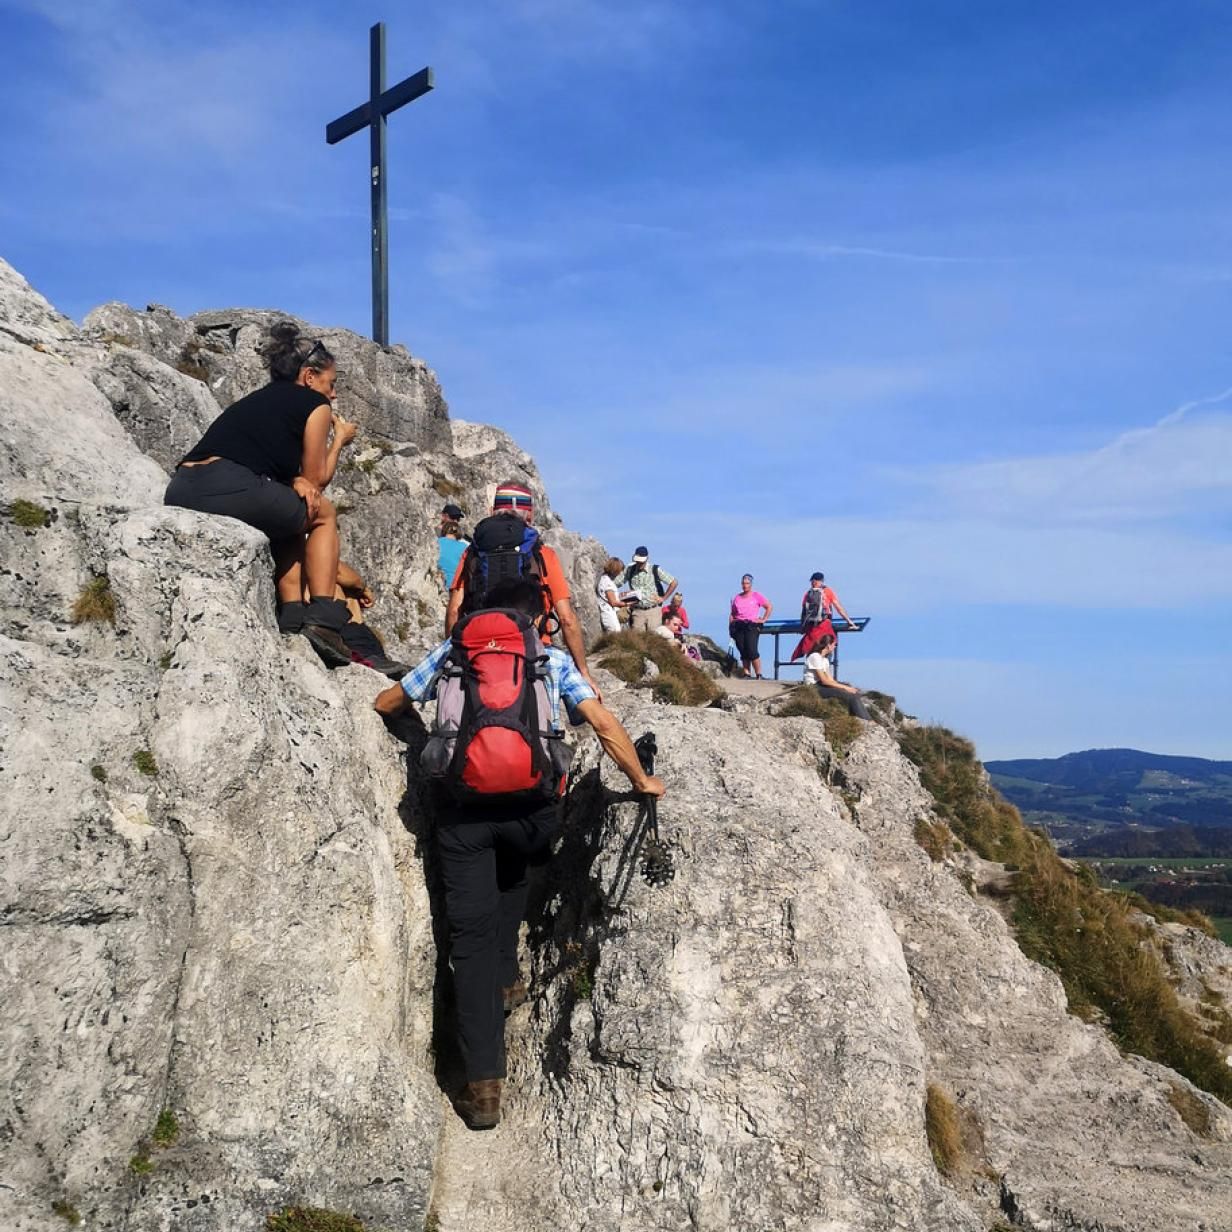 partnersuche bergwandern